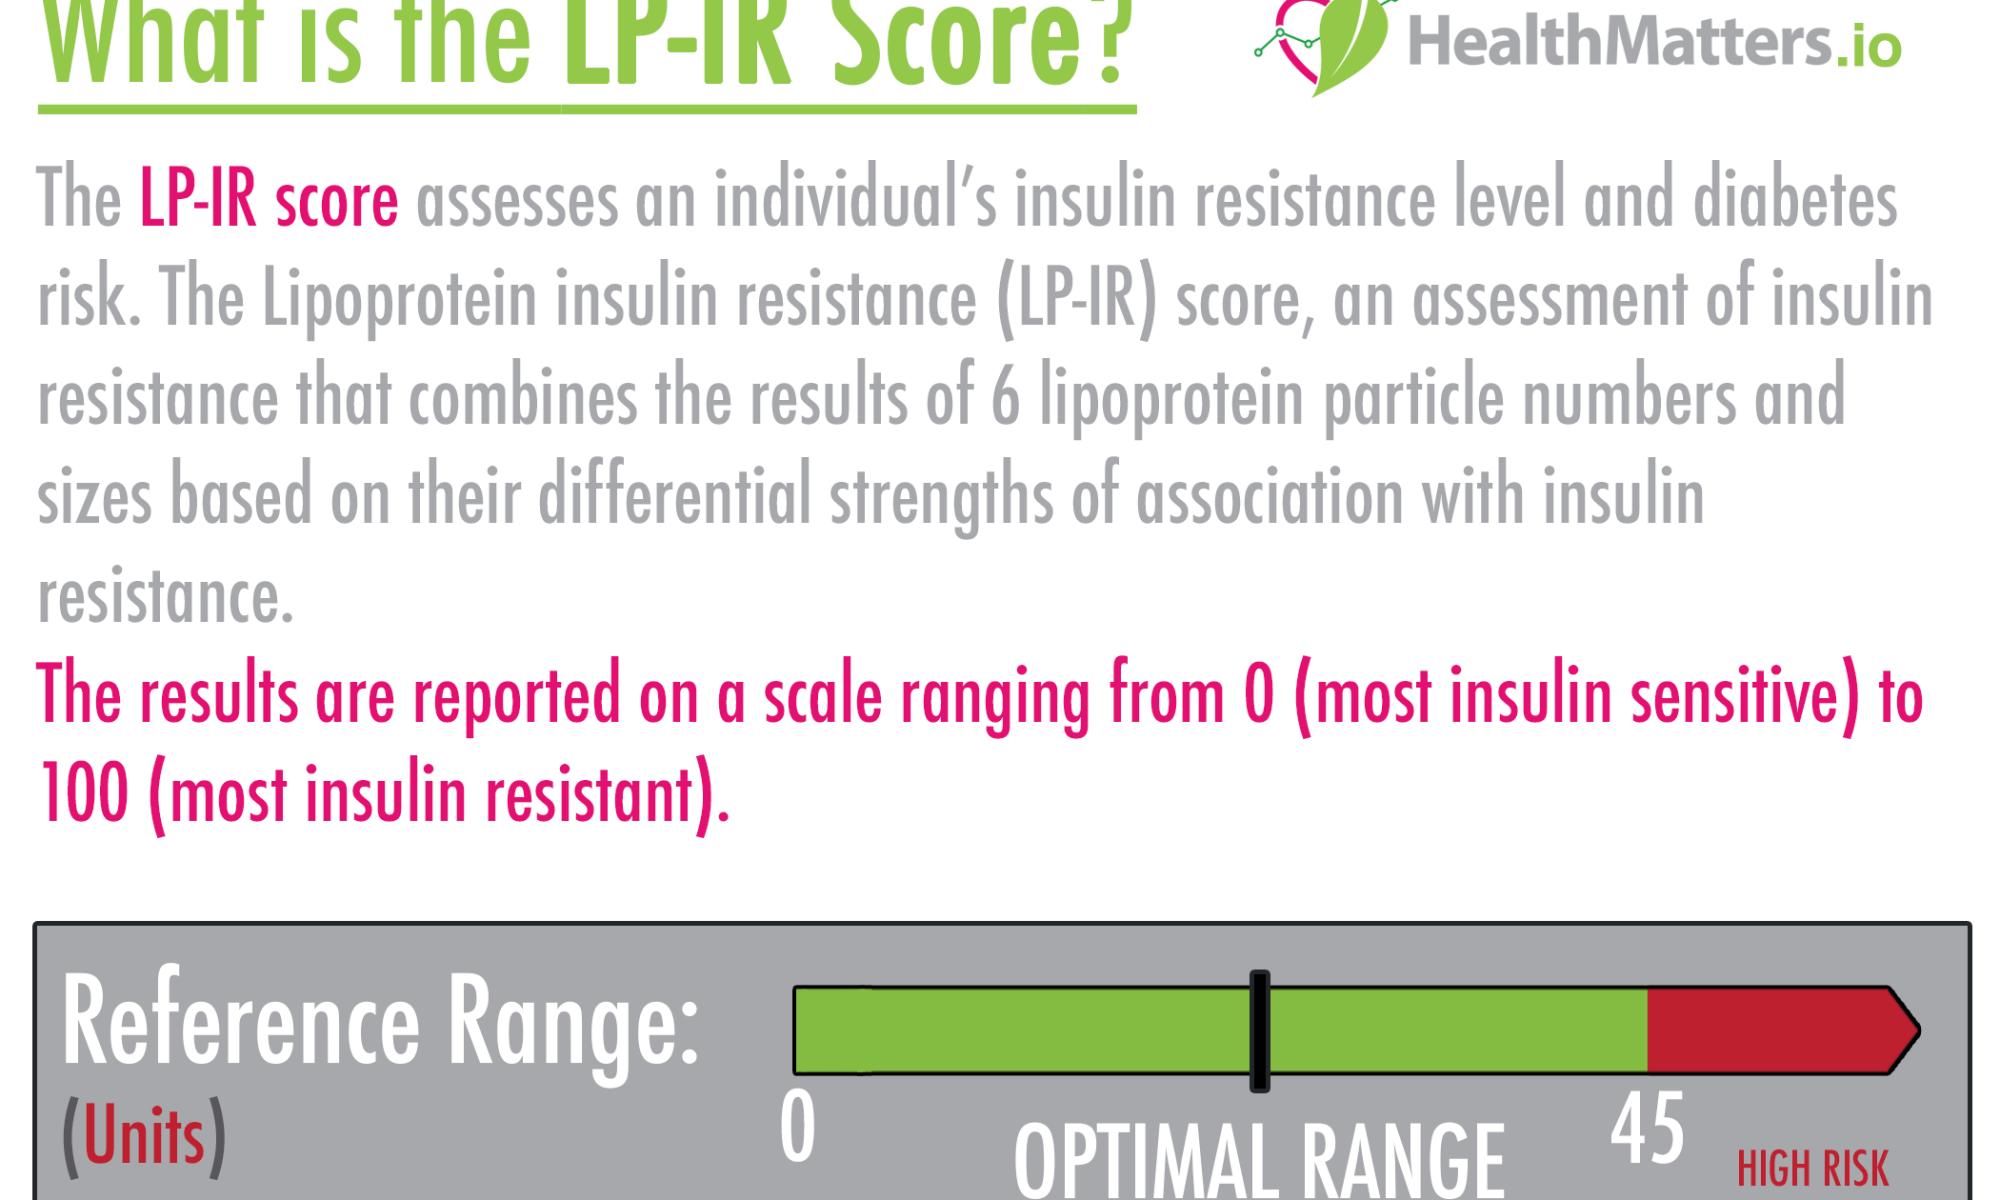 LP-IR score LDL HLD T2D type 2 diabetes high low meaning treatment vegan